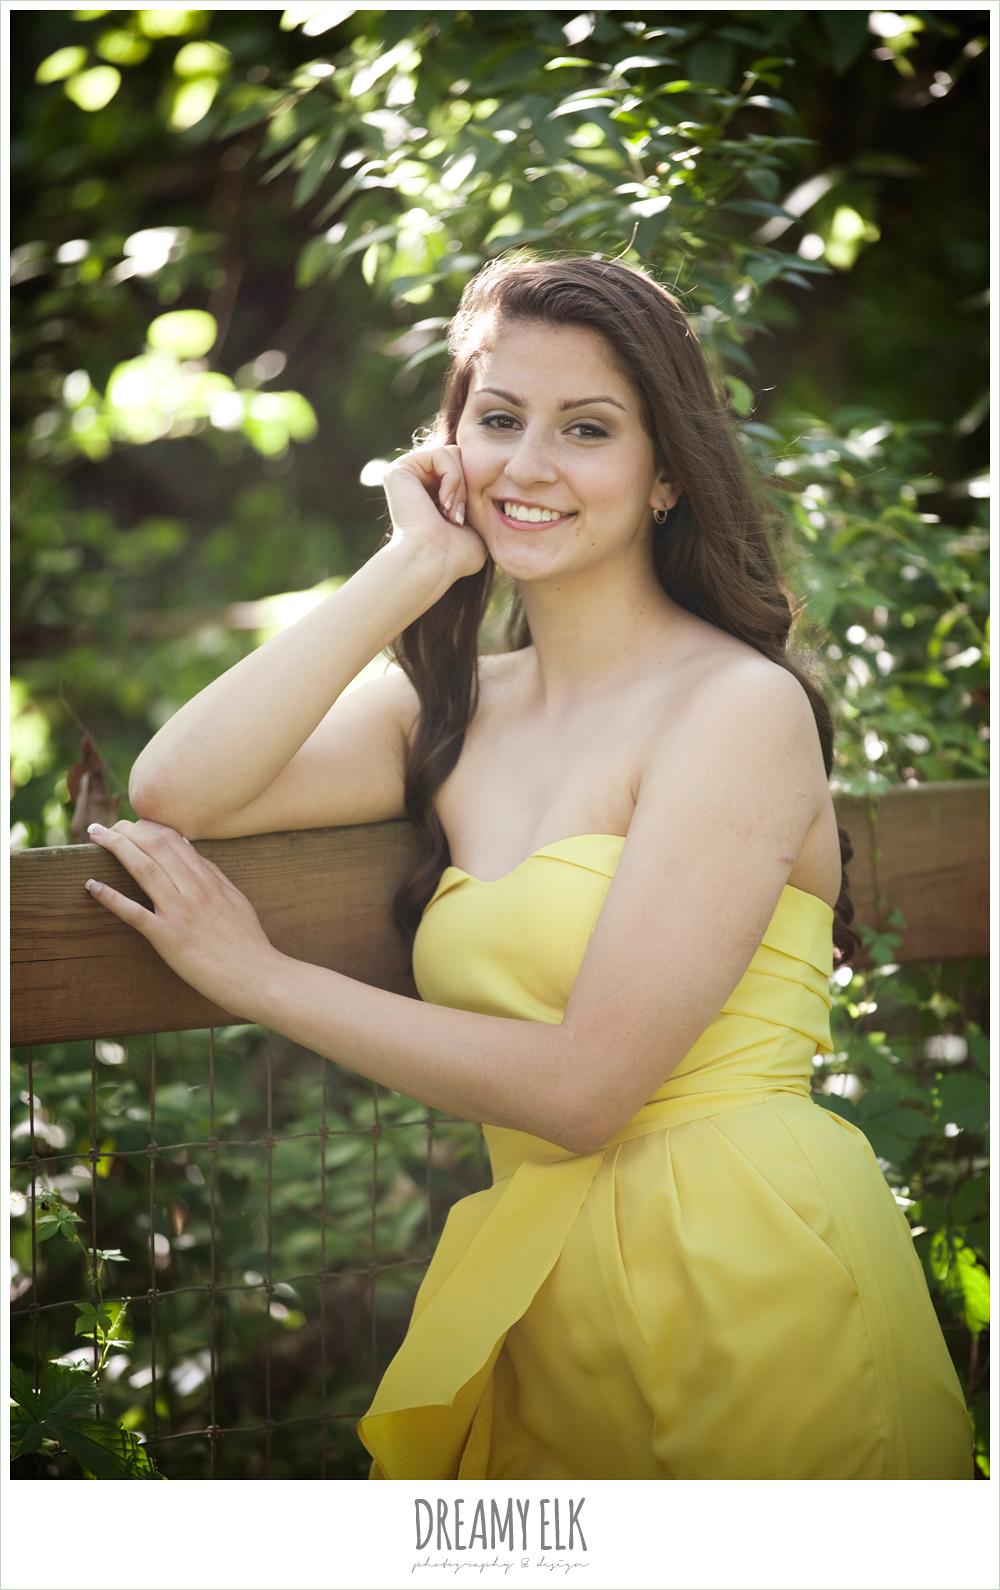 evan high school senior yellow dress leaning against fence